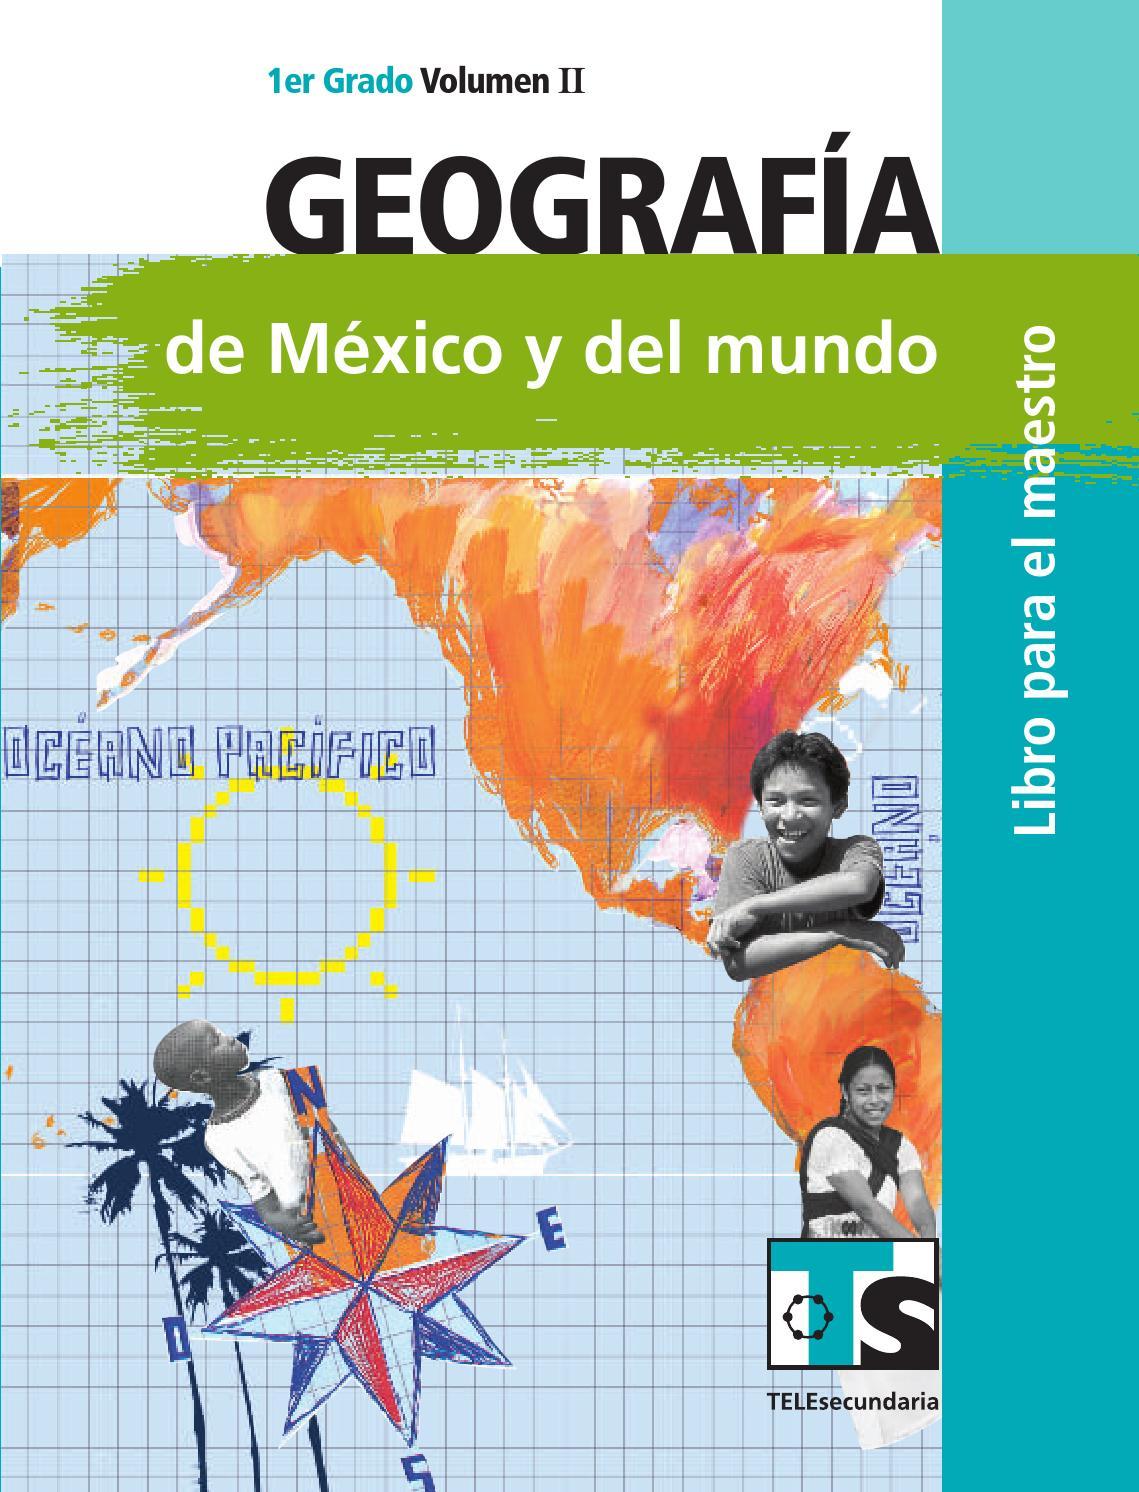 Maestro. Geografía 1er. Grado Volumen II by Rarámuri - issuu